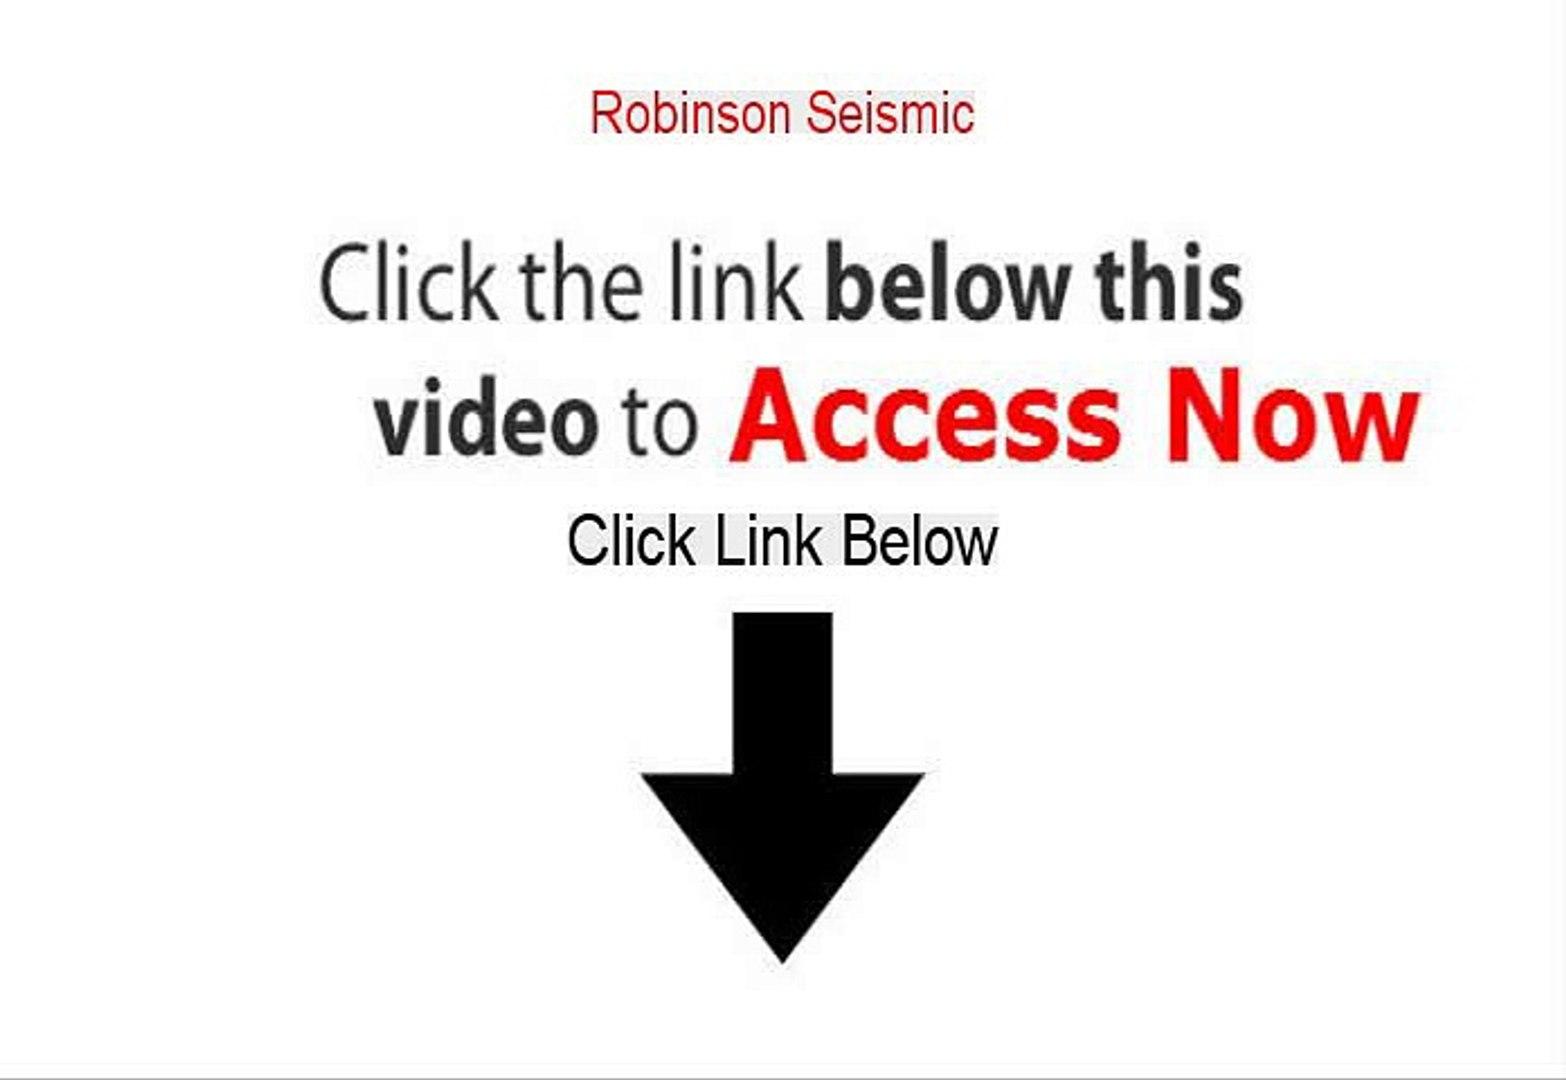 Robinson Seismic PDF Free (robinson seismic malaysia 2015)